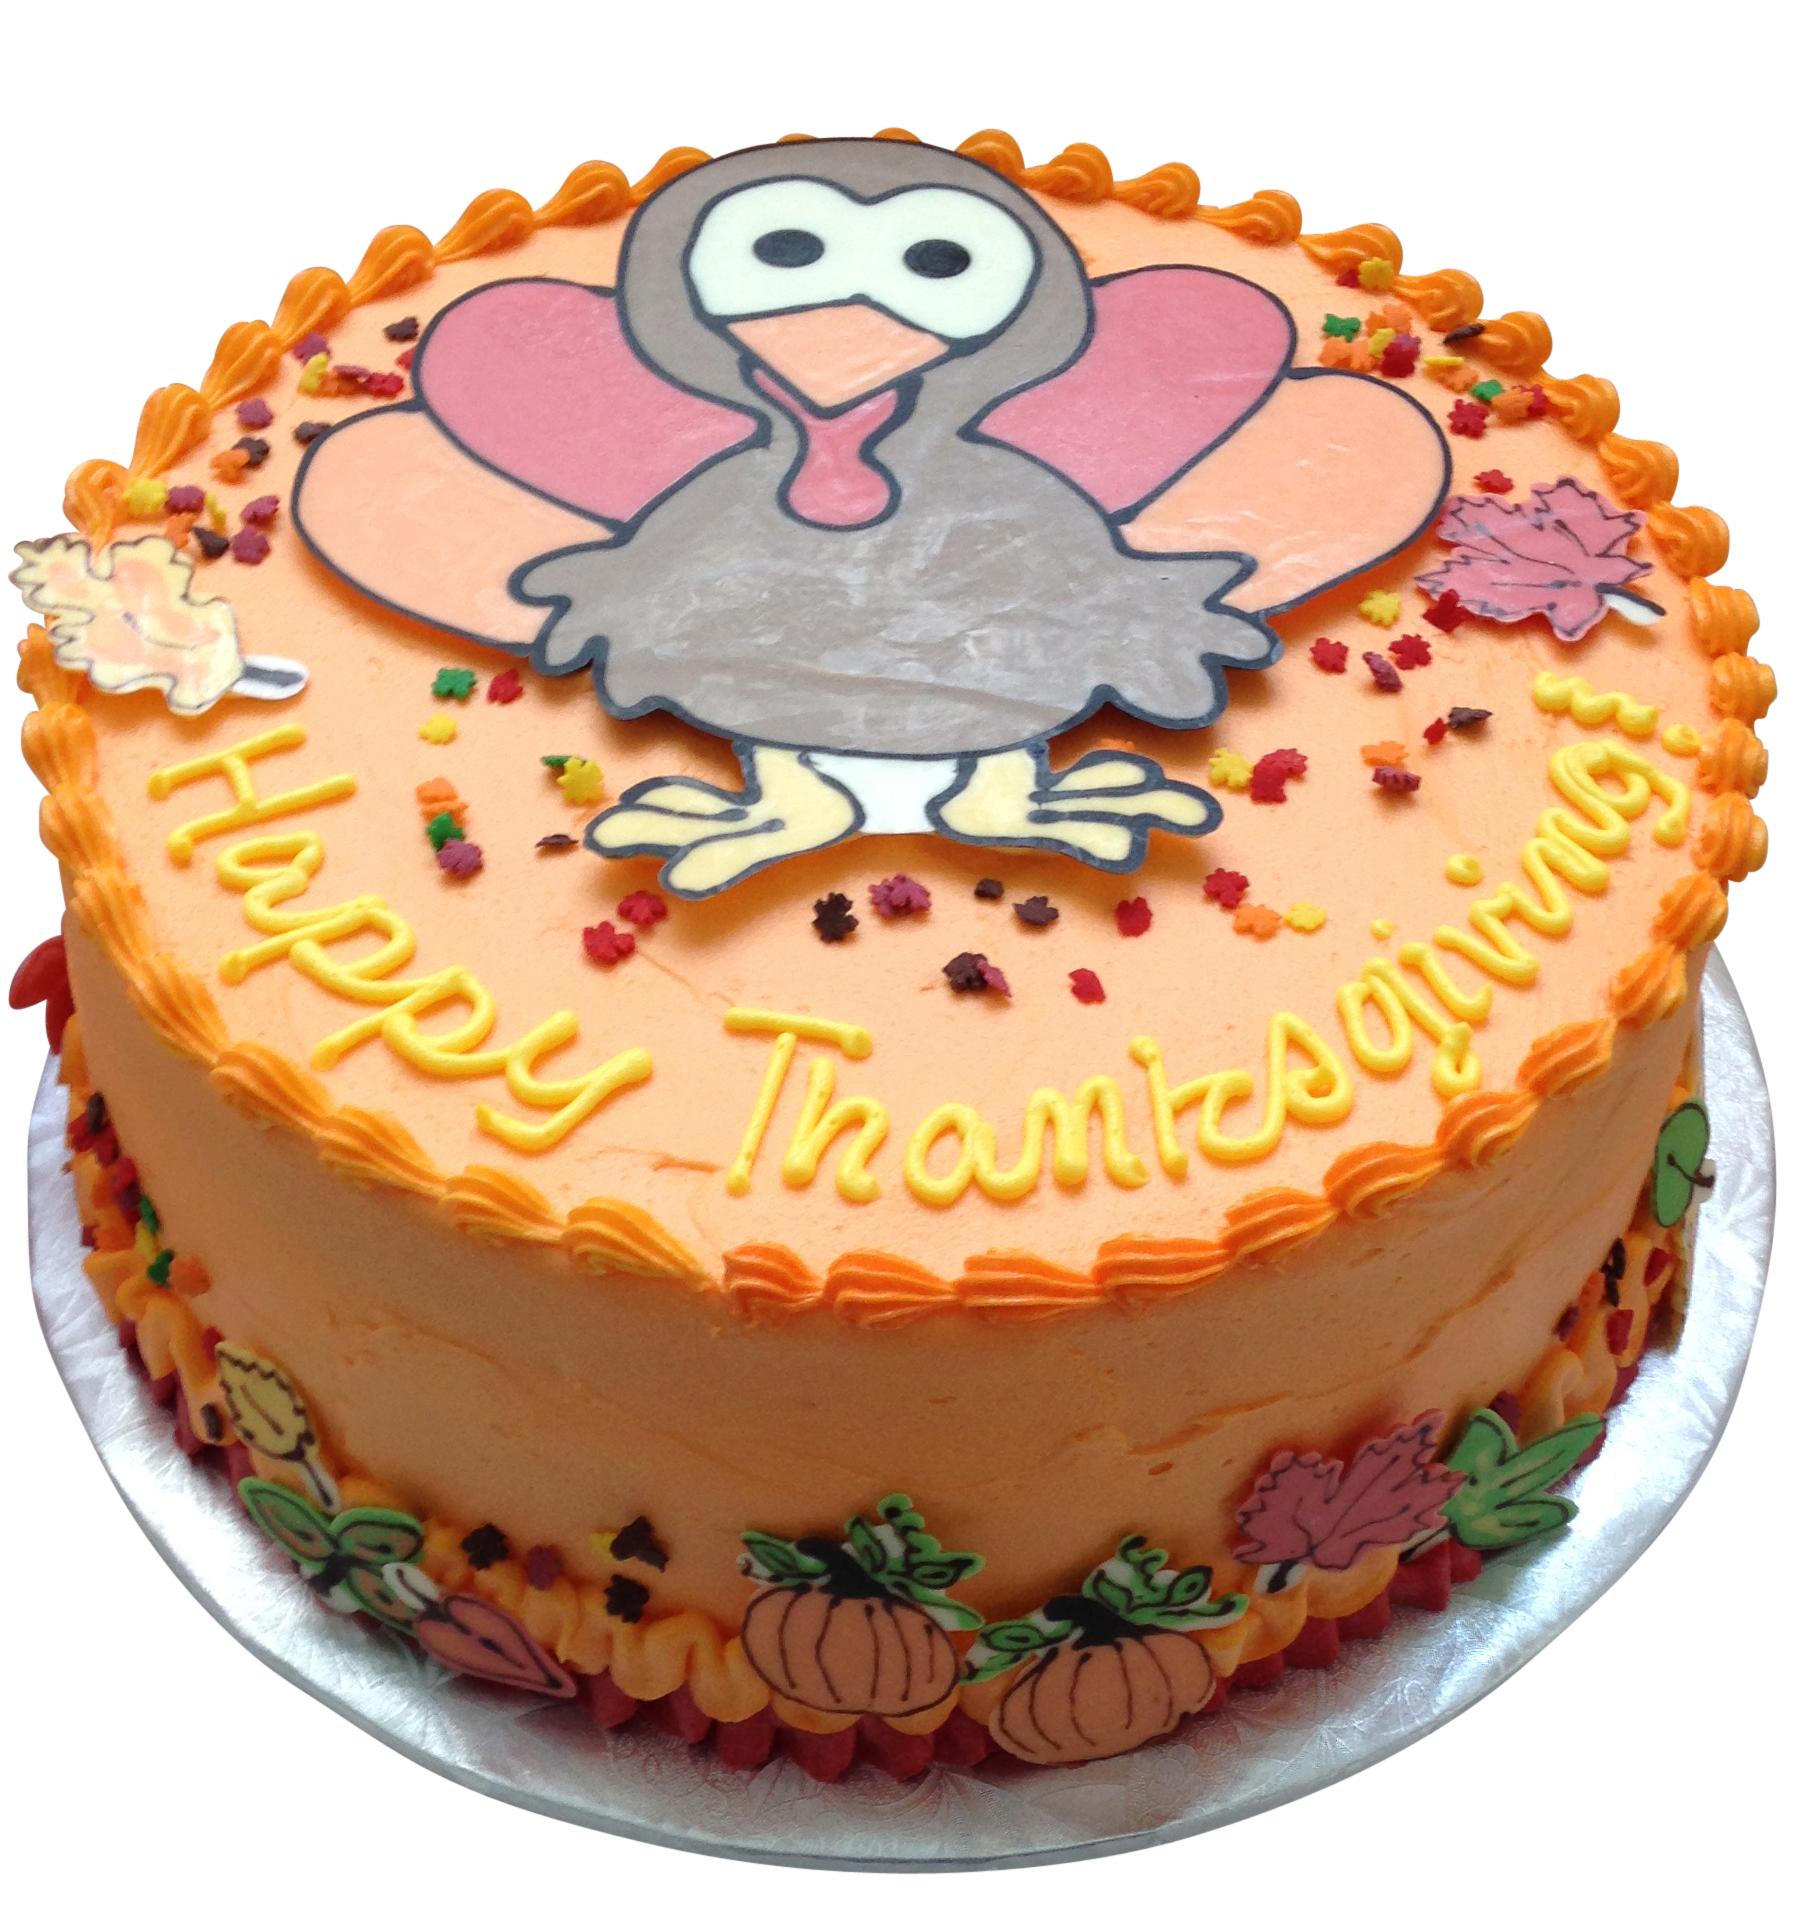 BeBe-Cakes-ThanksgivingCake1.JPG